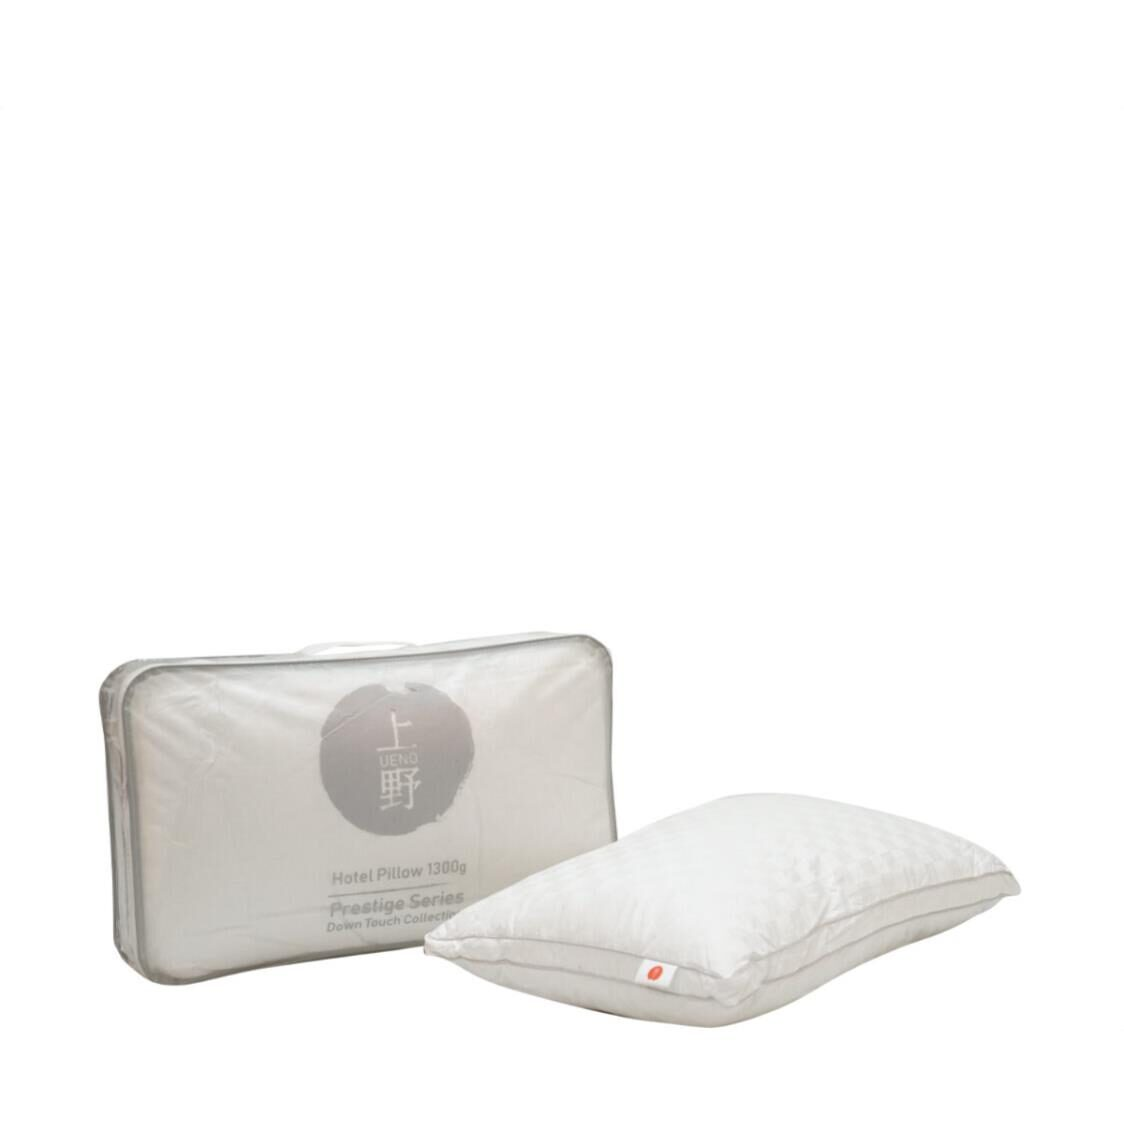 Ueno Prestige series Down Touch 1300g Pillow